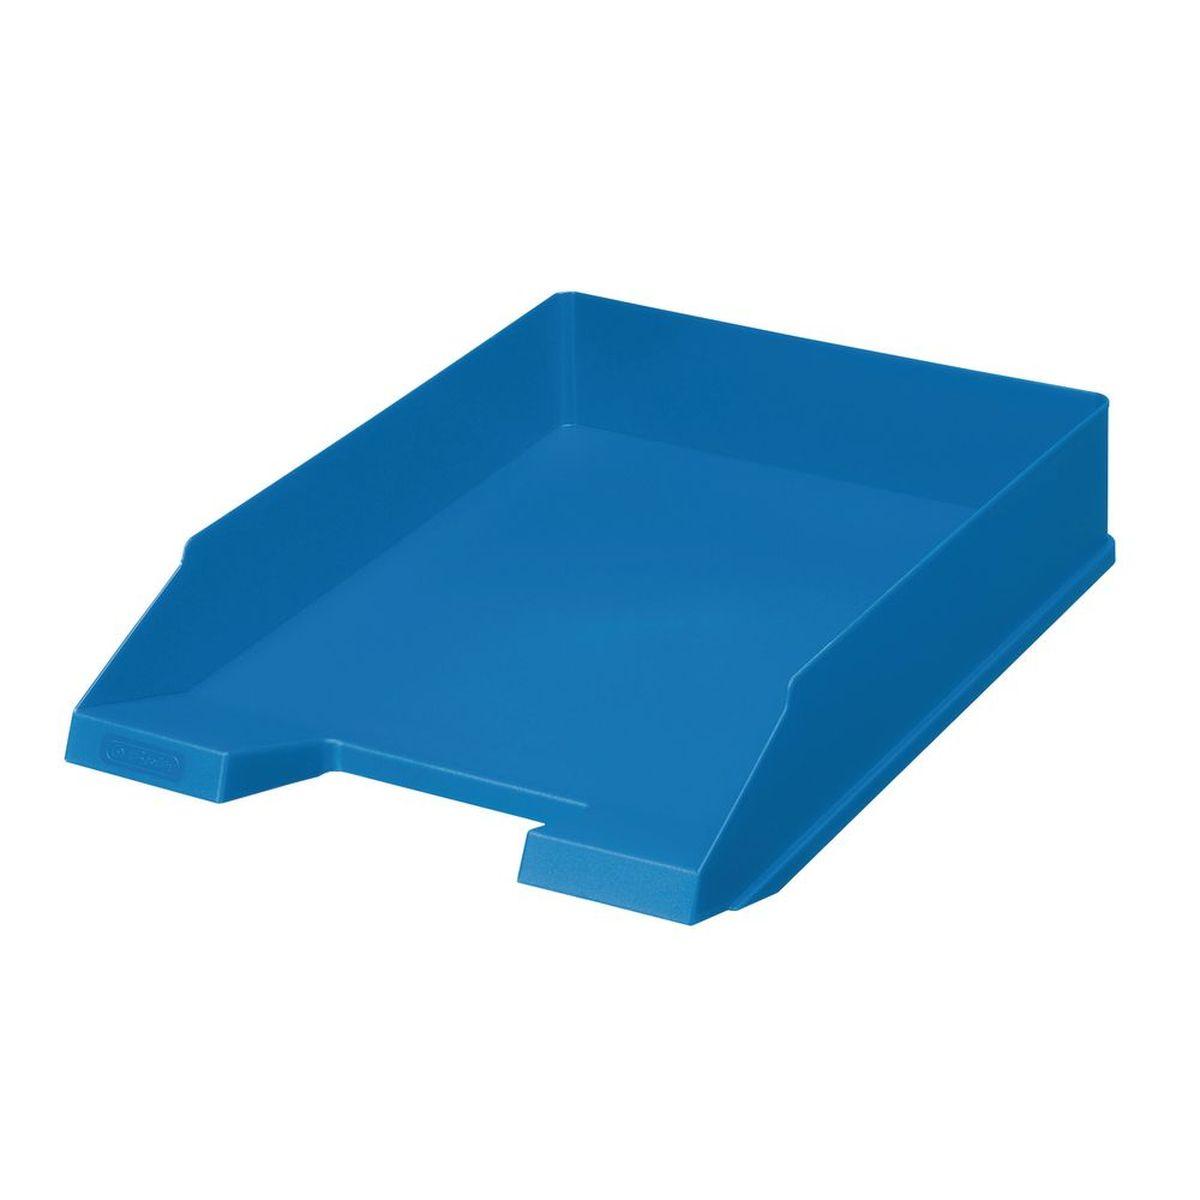 Herlitz Лоток для бумаг Colour Blocking цвет синий